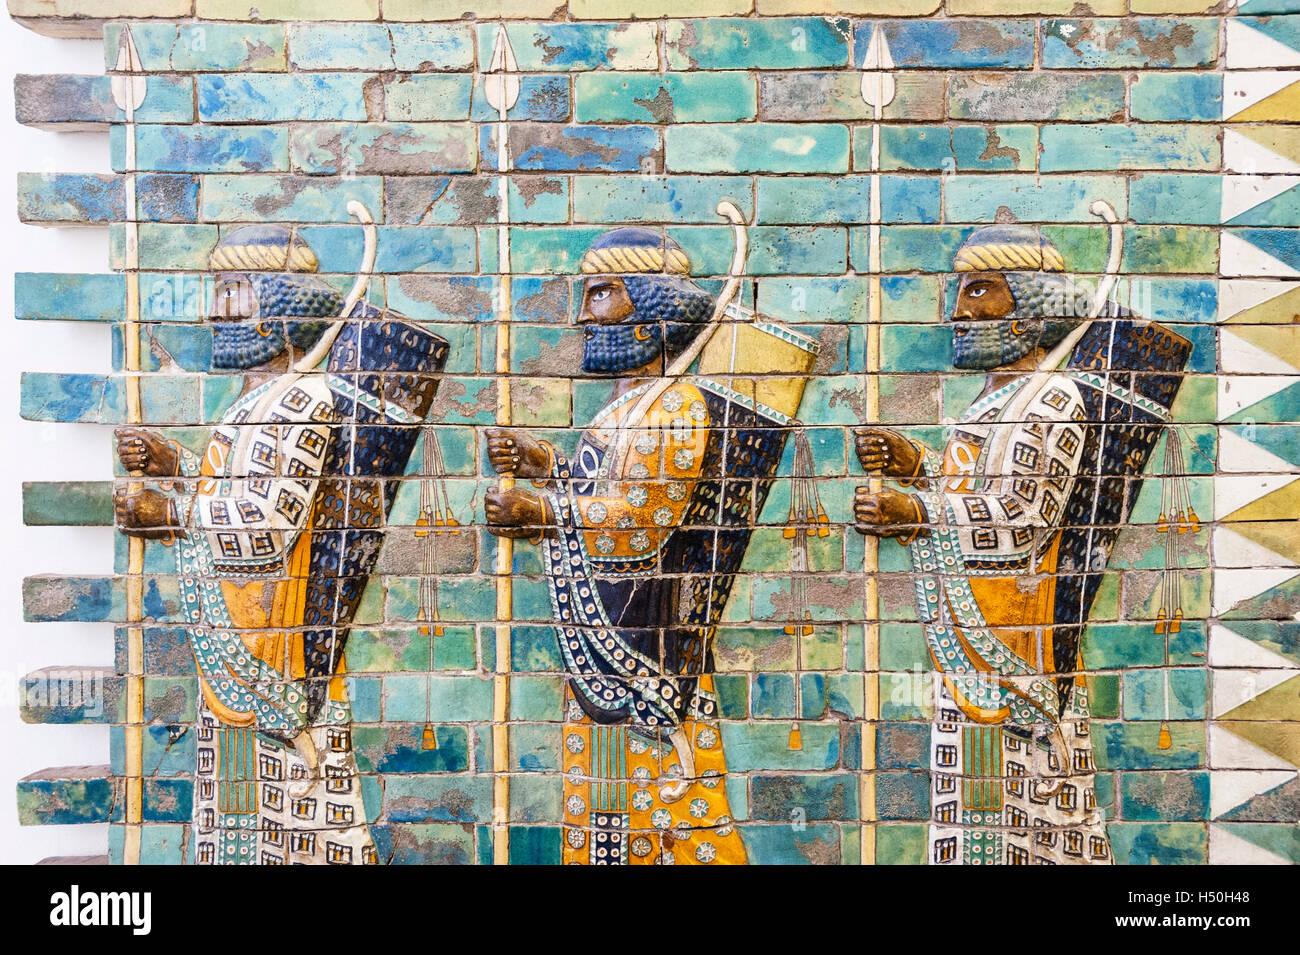 Museum Island,  Pergamon Museum Ancient Assyrian ceramic frieze in Germany, Berlin, UNESCO World Heritage Site - Stock Image